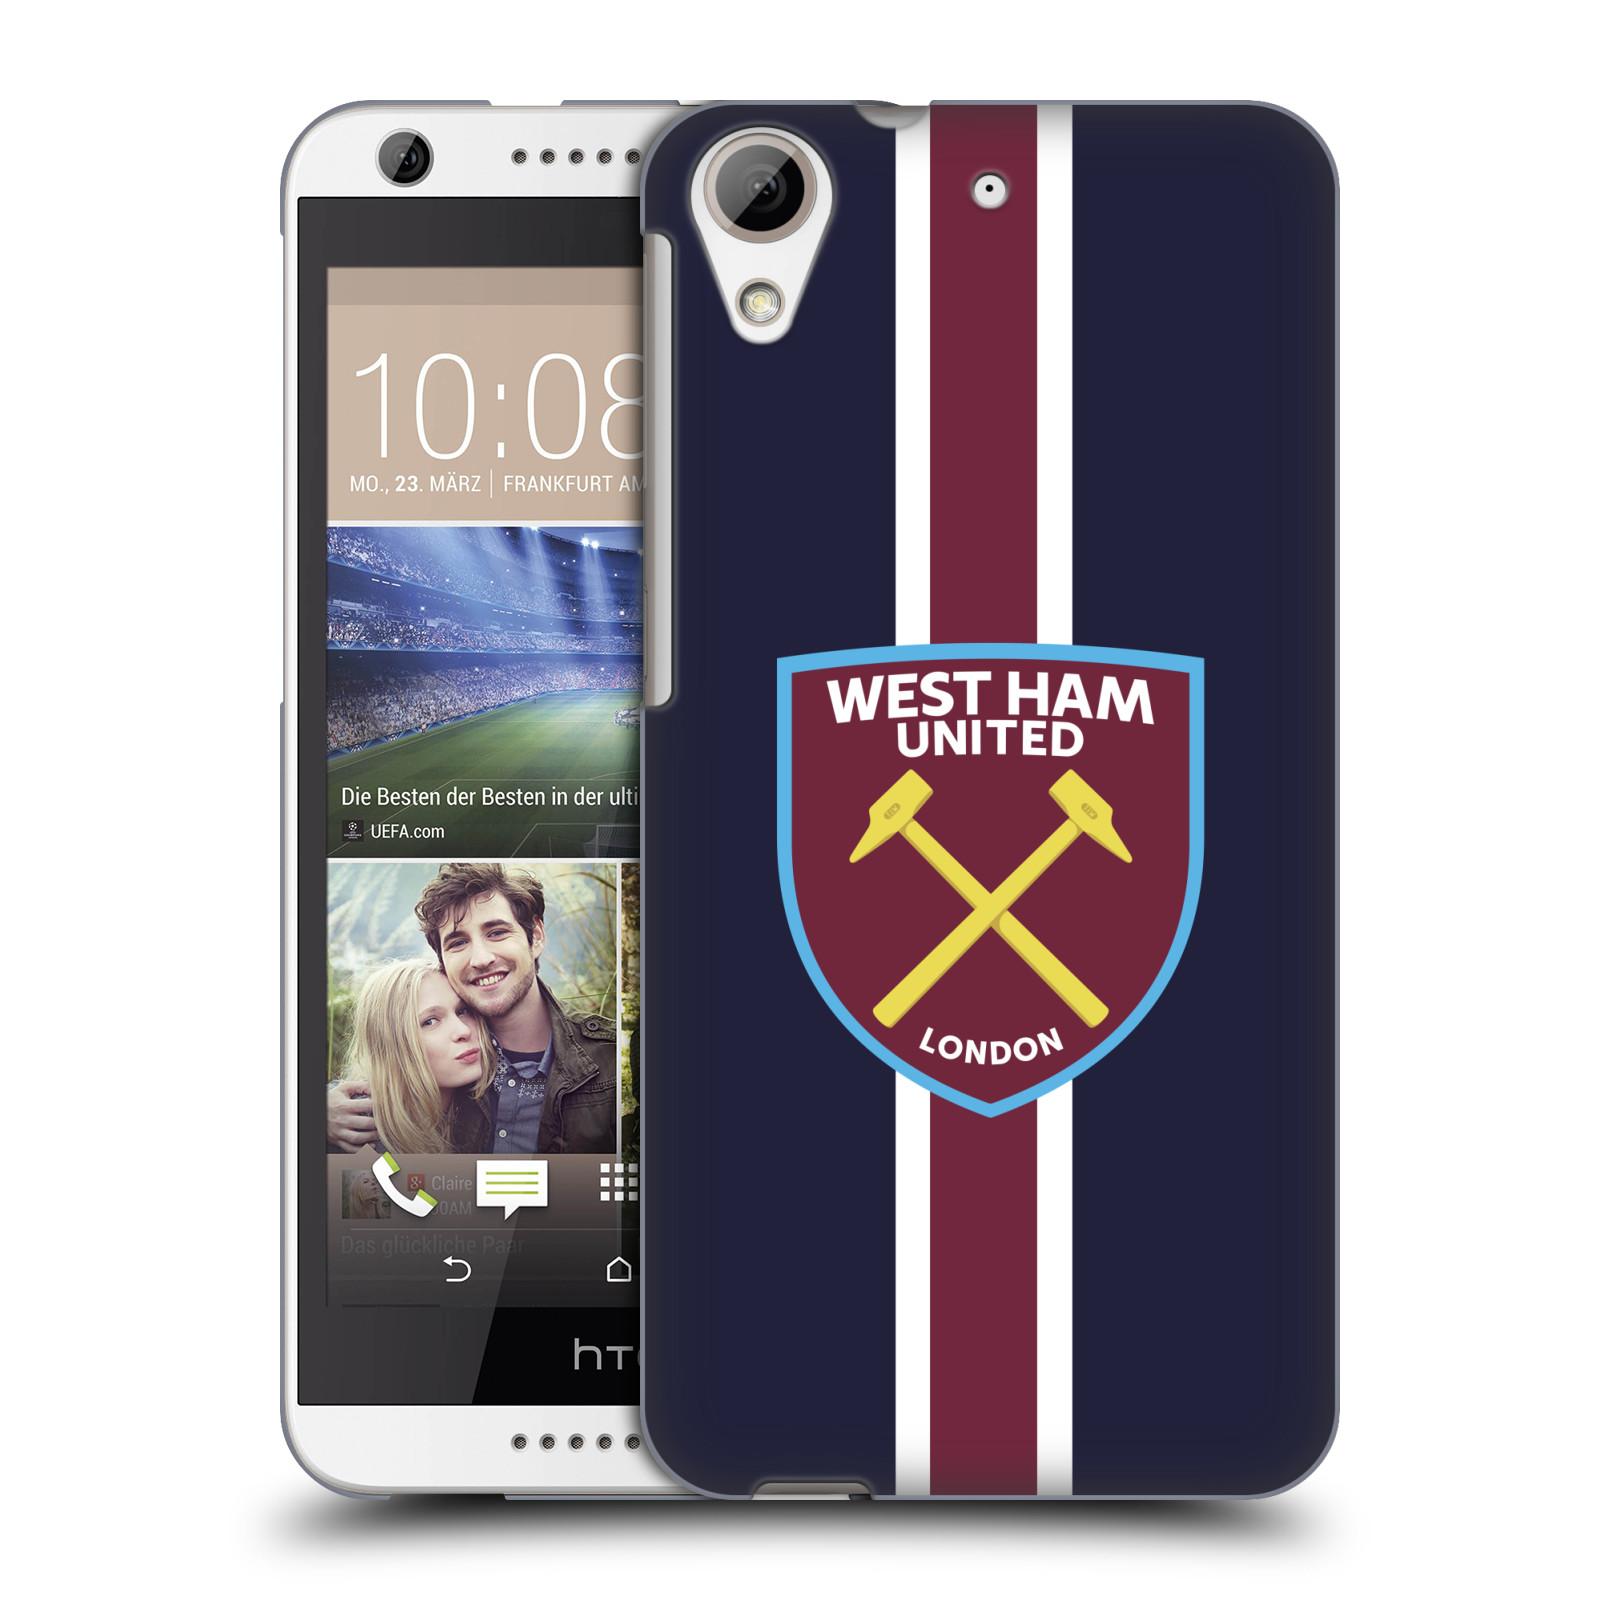 Plastové pouzdro na mobil HTC Desire 626 / 626G - Head Case - West Ham United - Pruhy